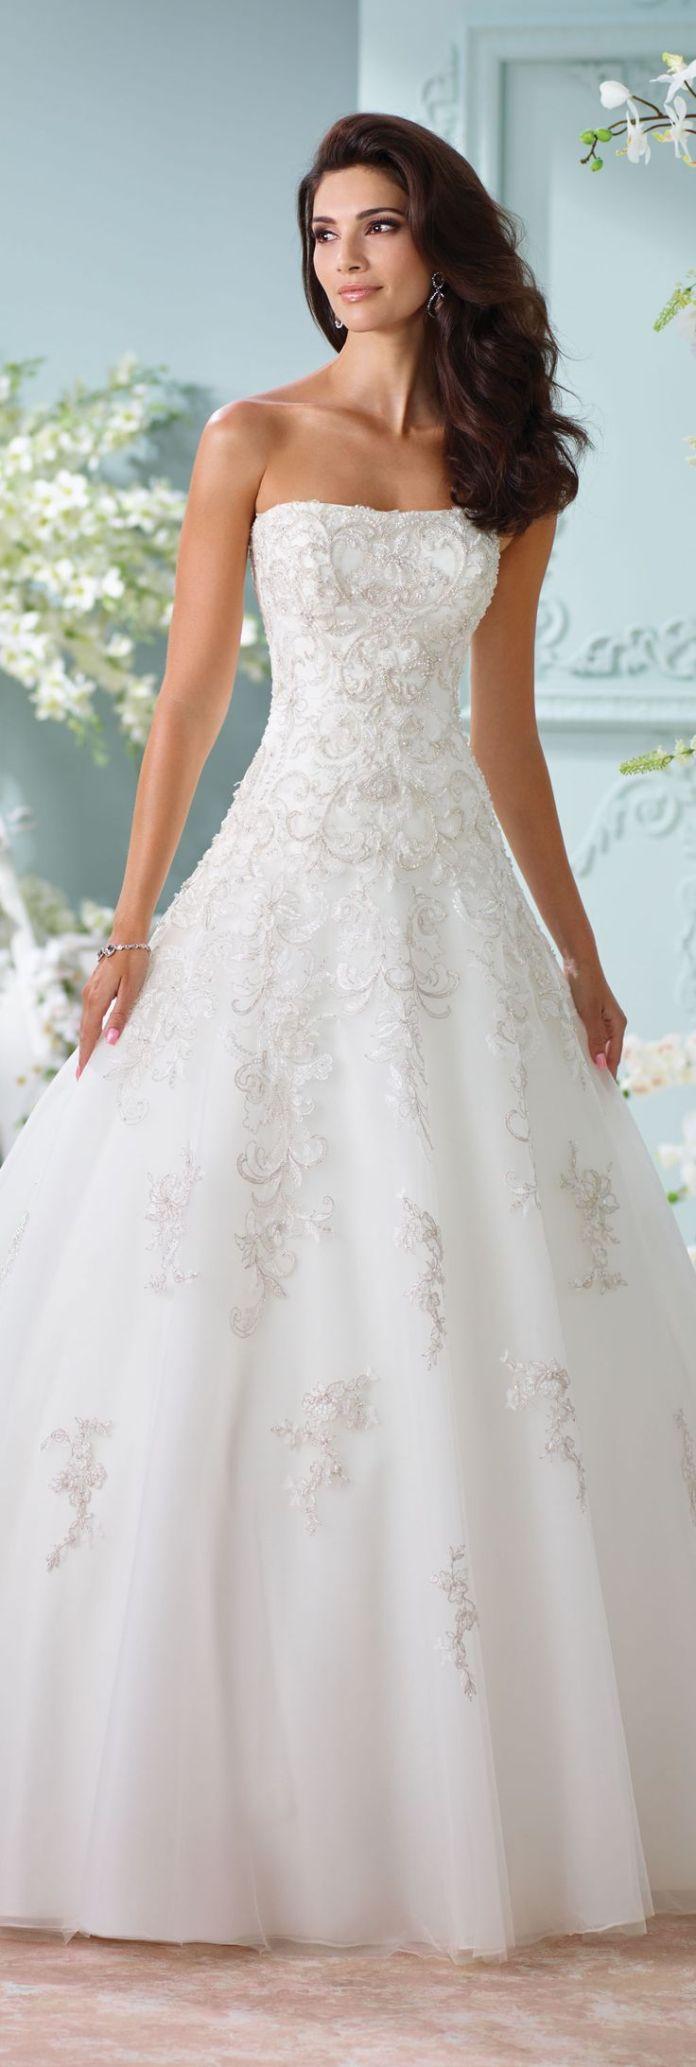 f860b4f51881d628fad5a08fb9b9ddaa--wedding-dress-tulle-strapless-wedding-dresses